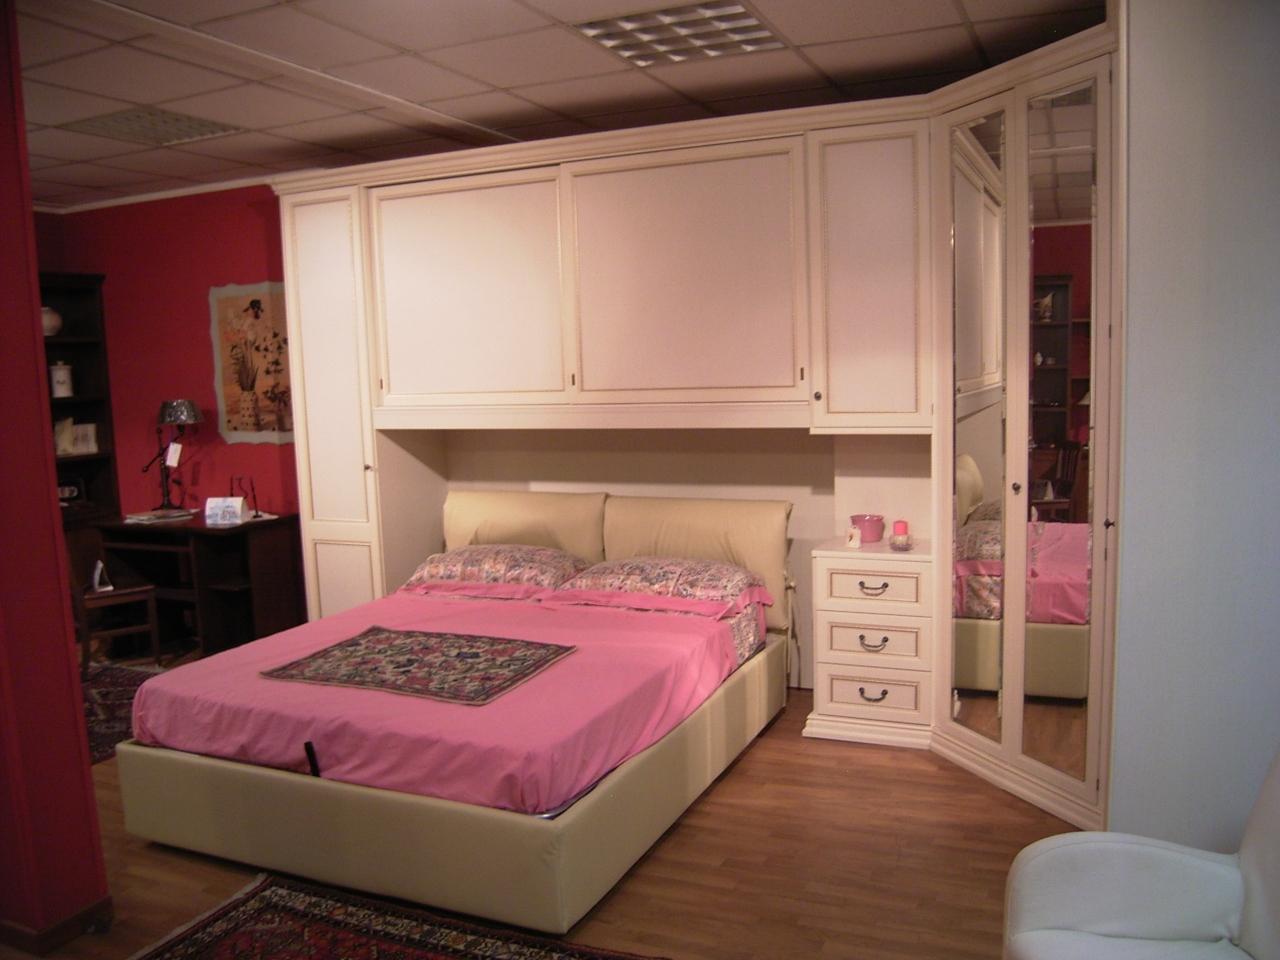 Adesivi murali orsetti beige per cameretta - Camera da letto a ponte ...